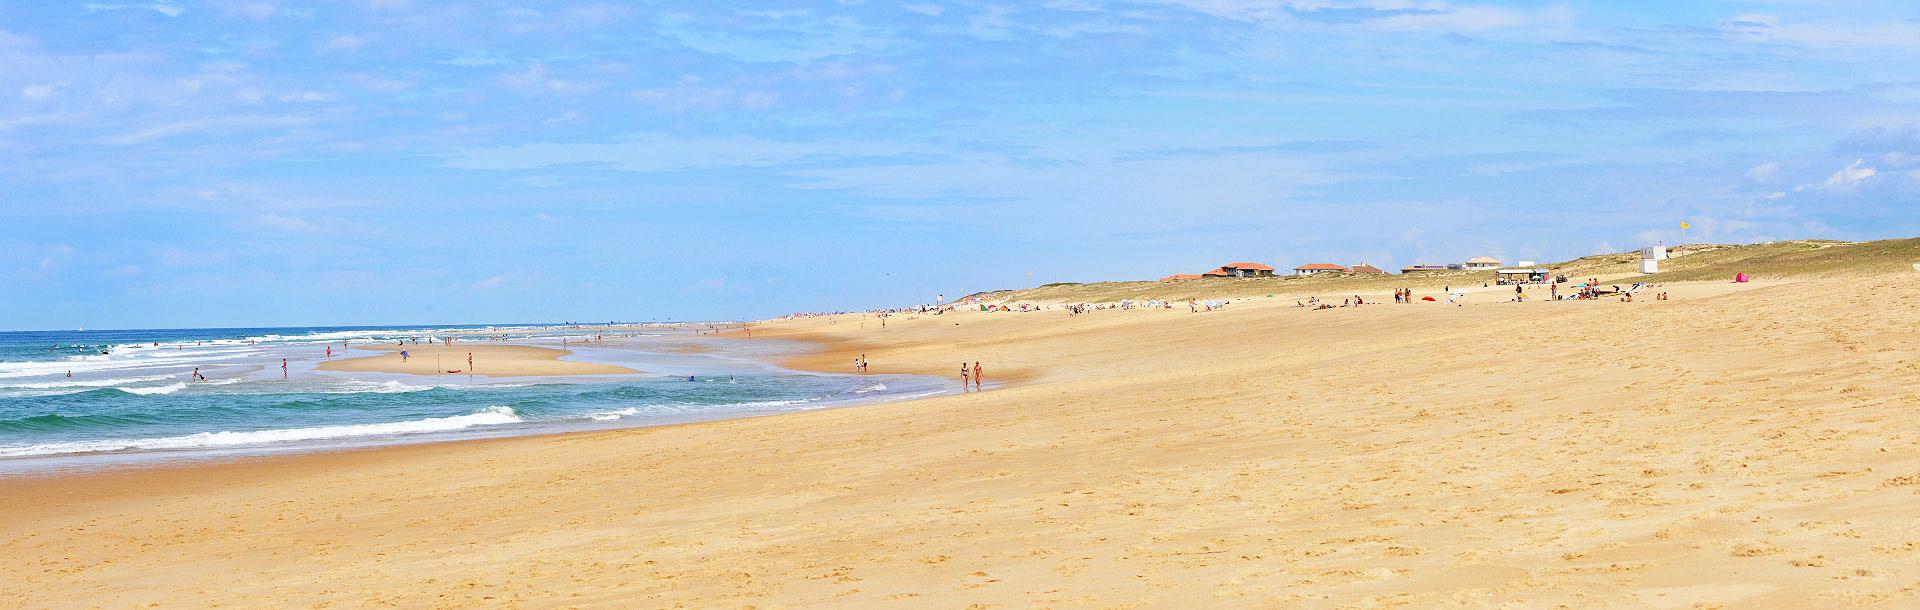 Seignosse, la plage - Photo Gérard Perez